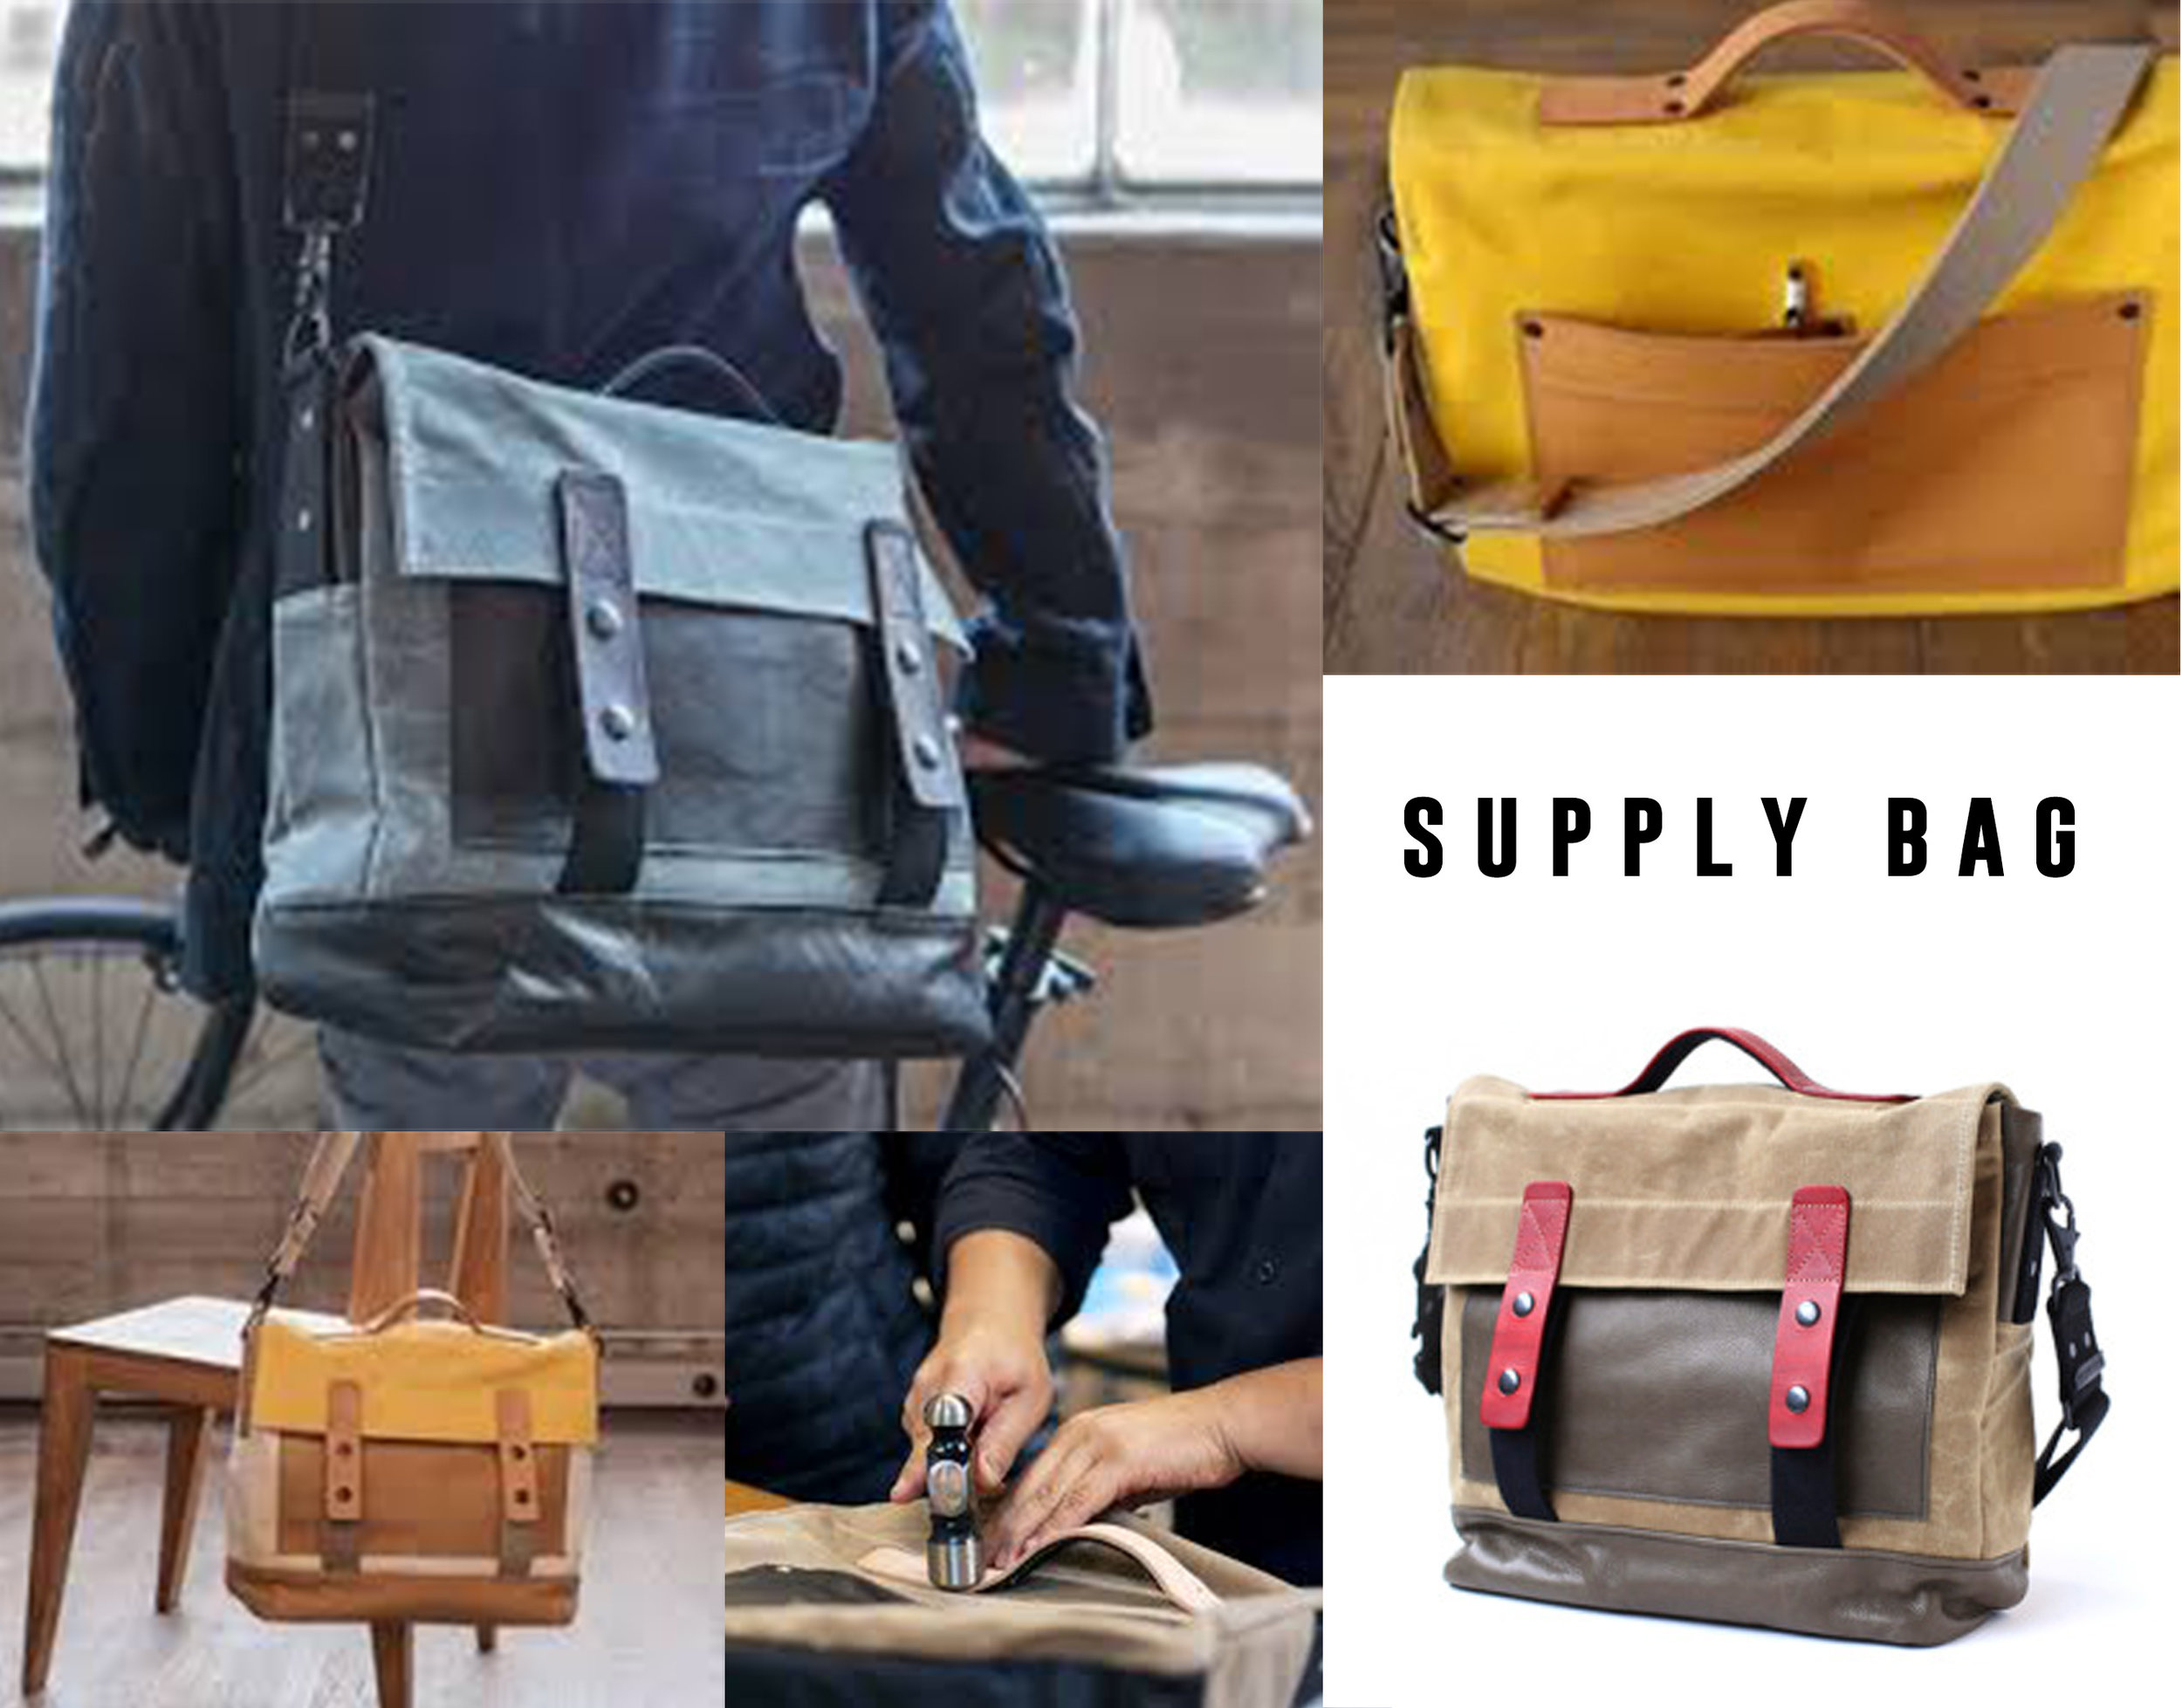 f-SUPPLY BAG.jpg